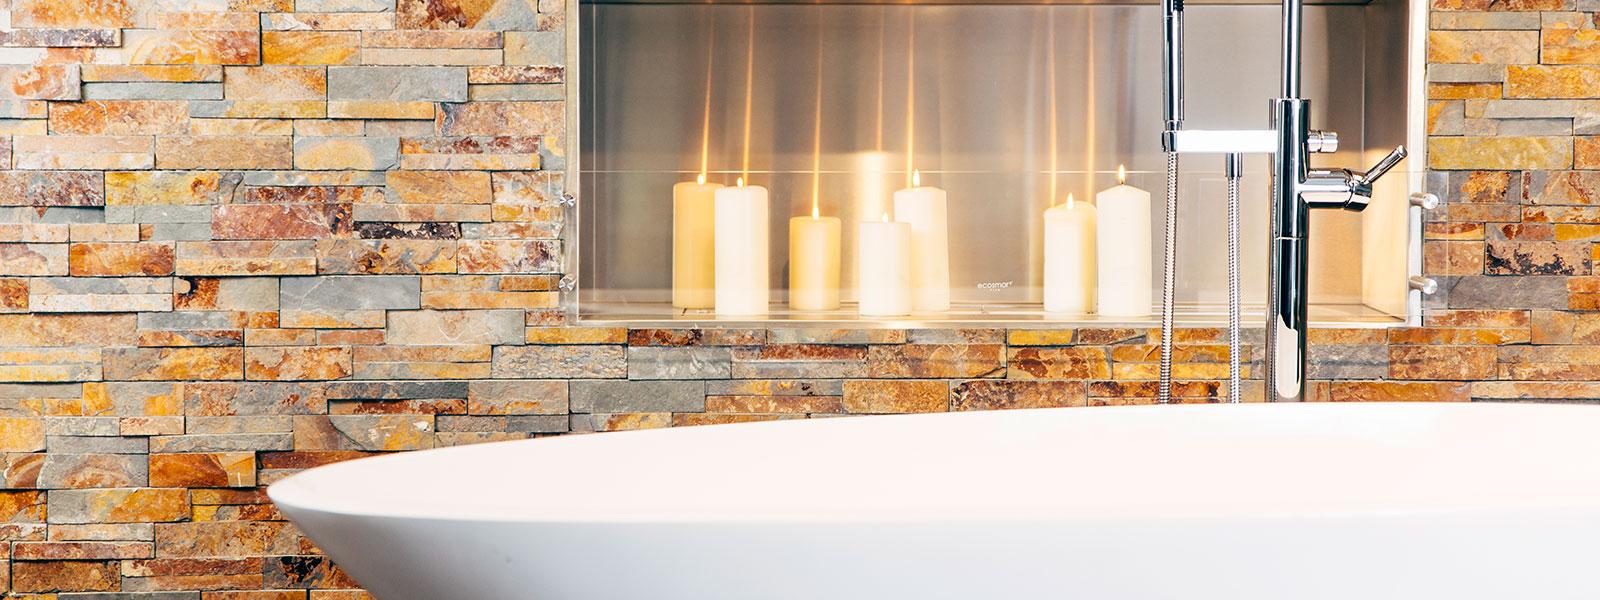 fliesen welt linnenbecker gmbh holzhandel. Black Bedroom Furniture Sets. Home Design Ideas